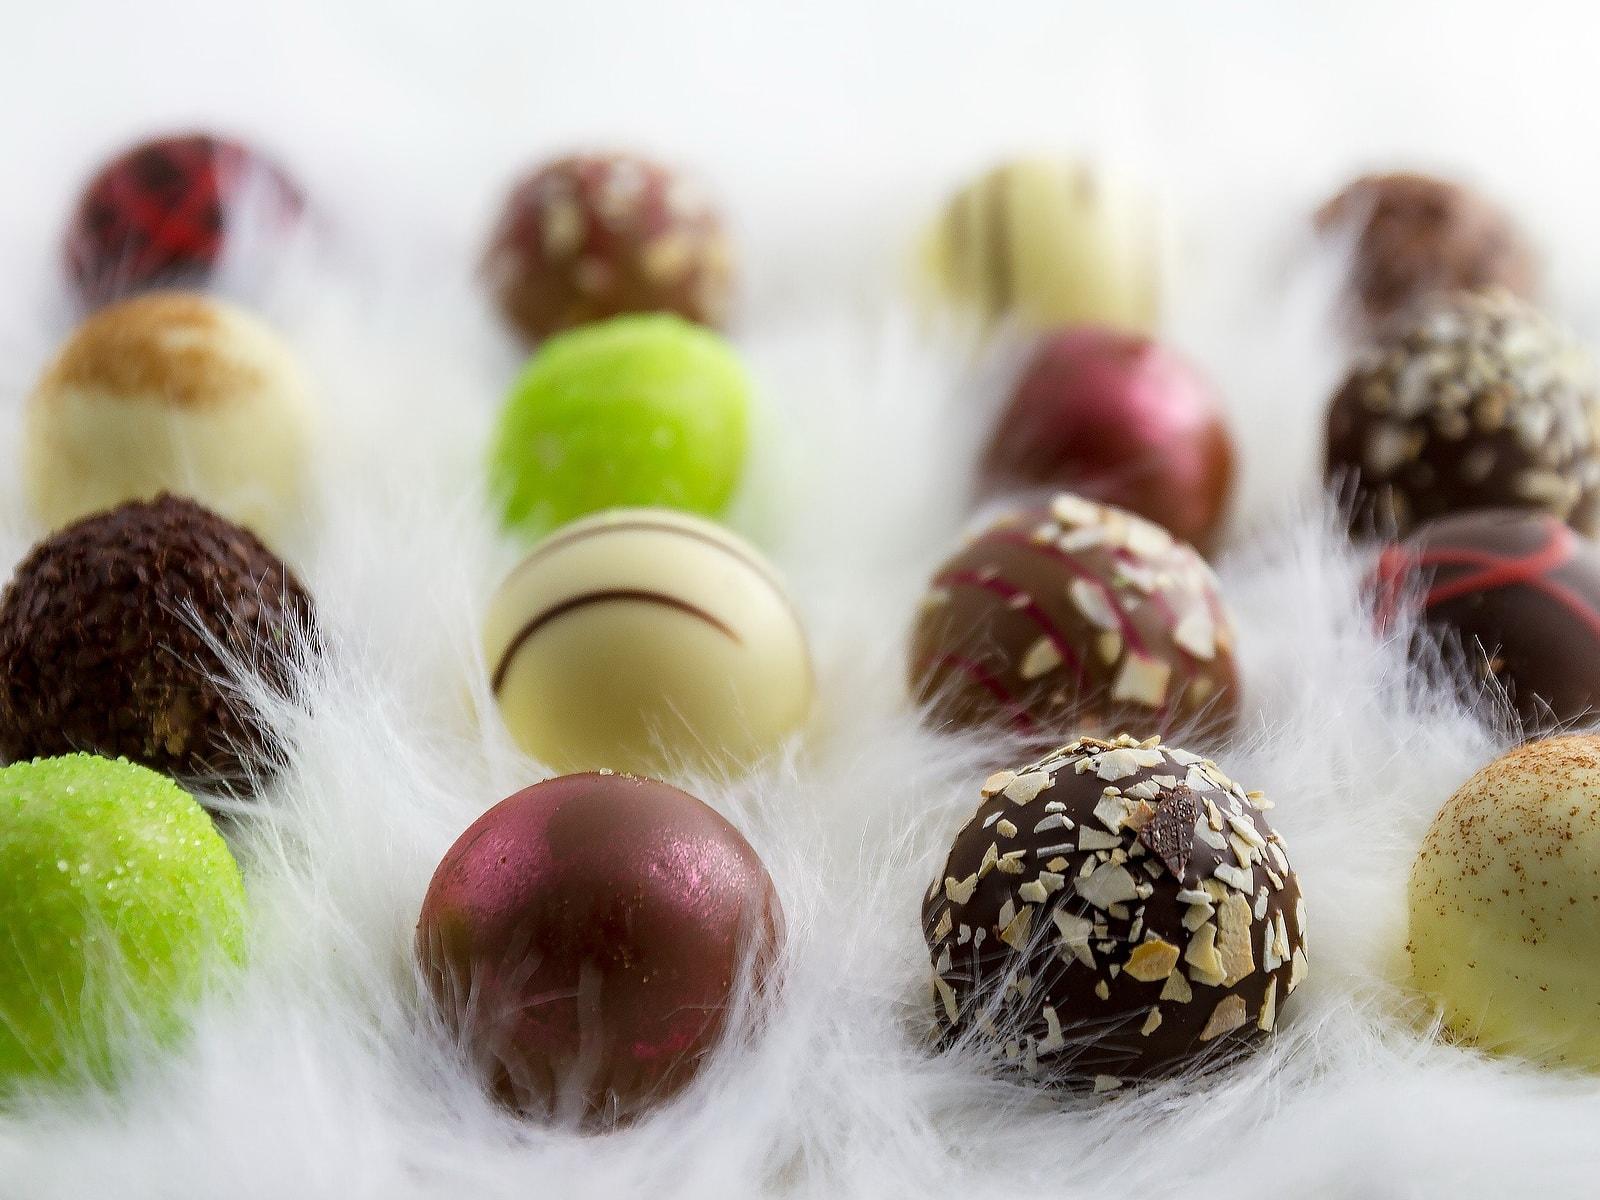 конфеты перед бегом вредны